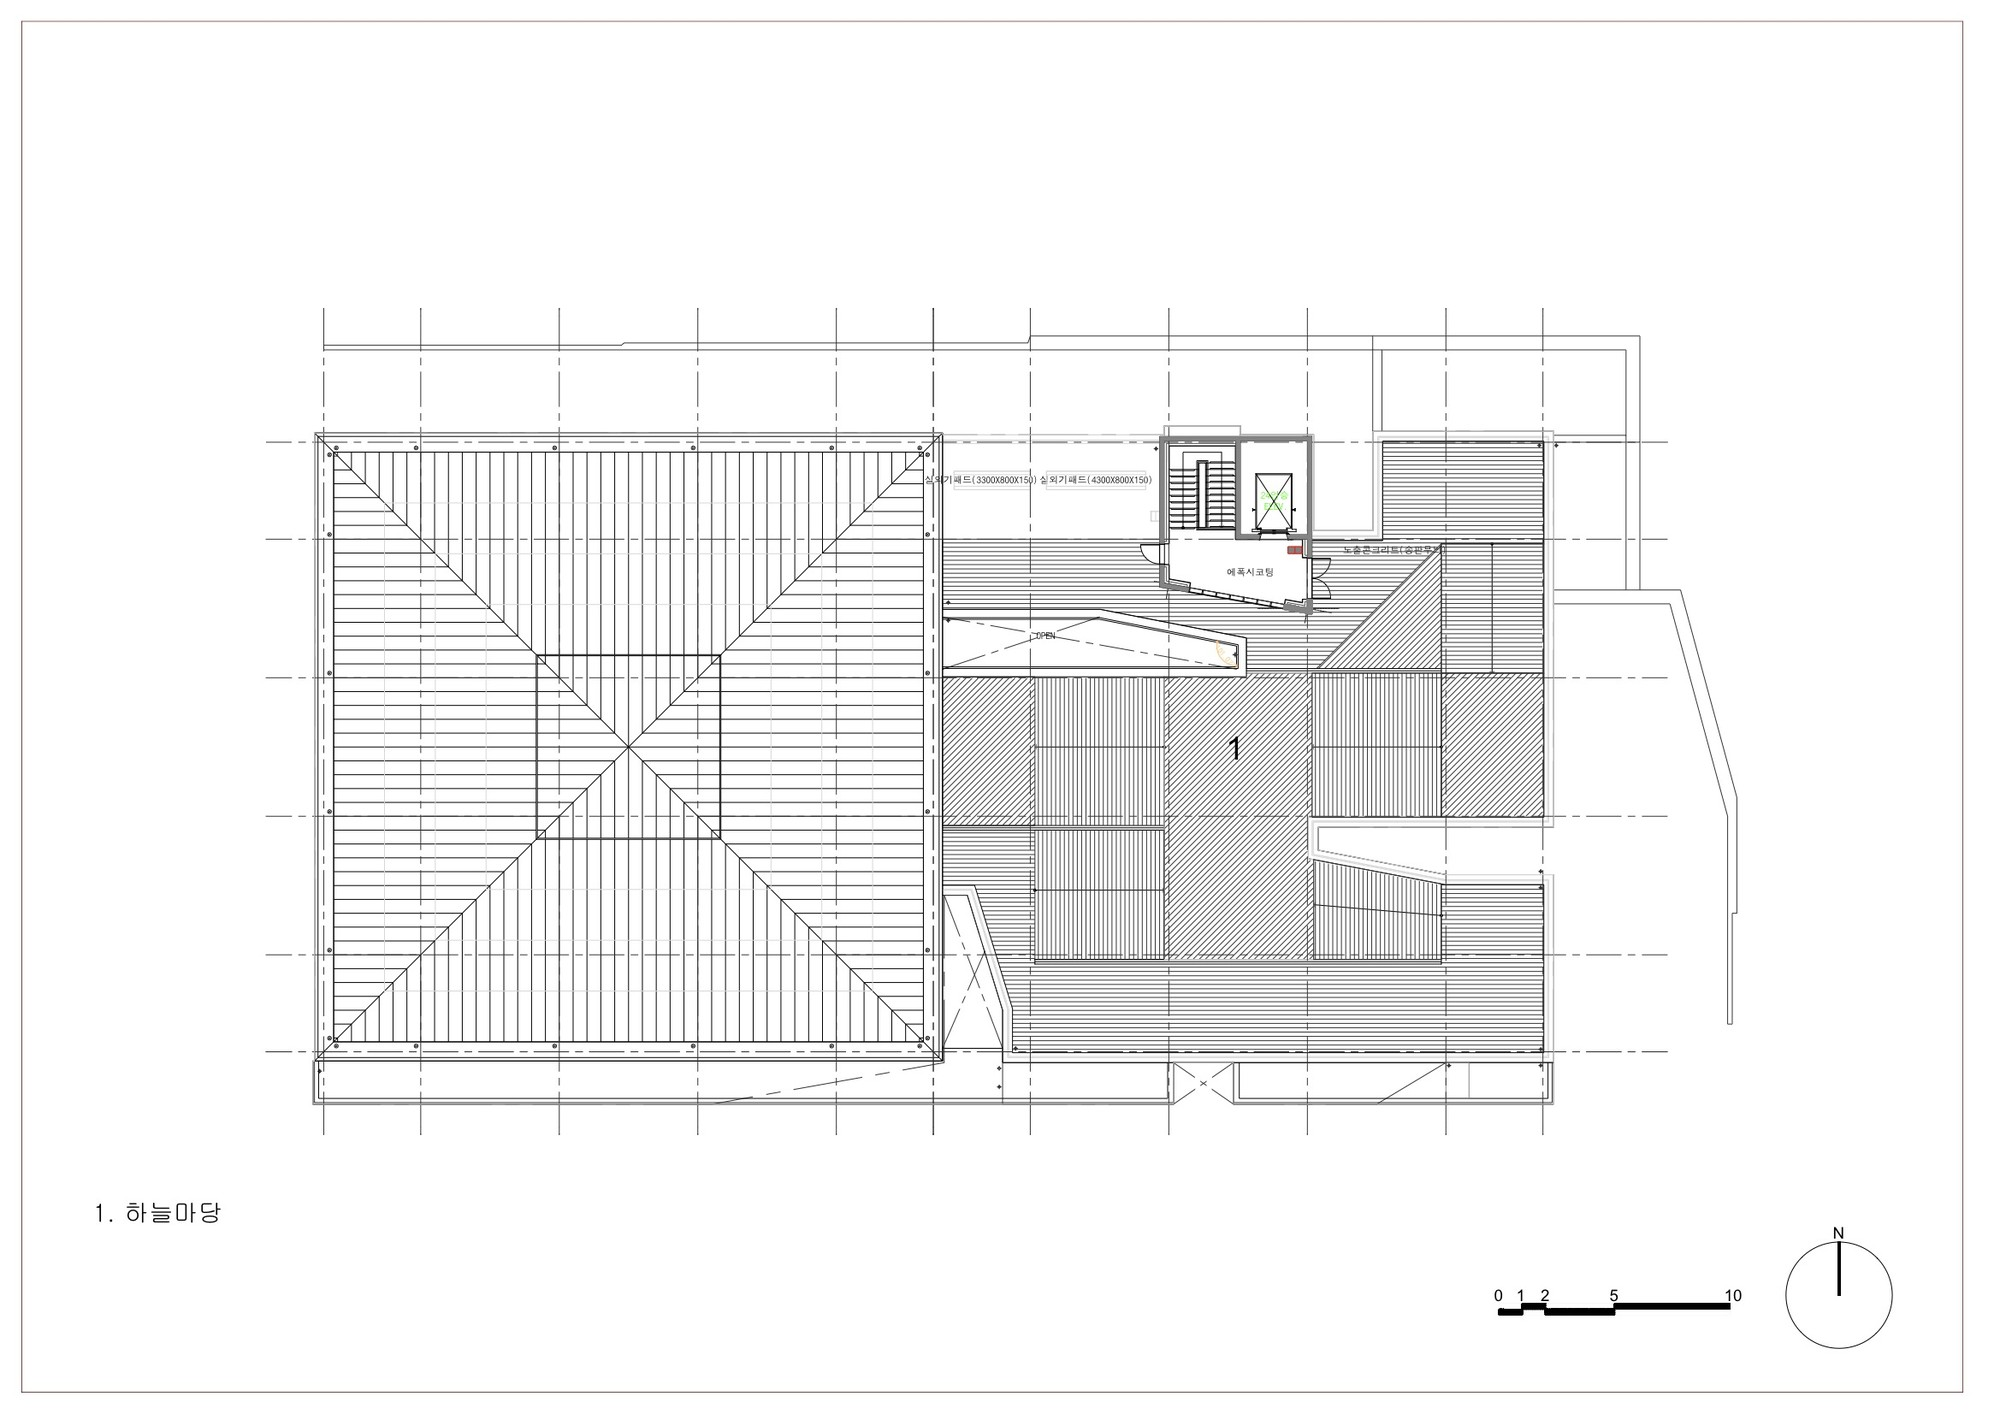 Nice Church Of Light Floor Plan Part - 8: Light Of Life Church / Shinslab Architecture + IISAC. 21 / 34. Floor Plan